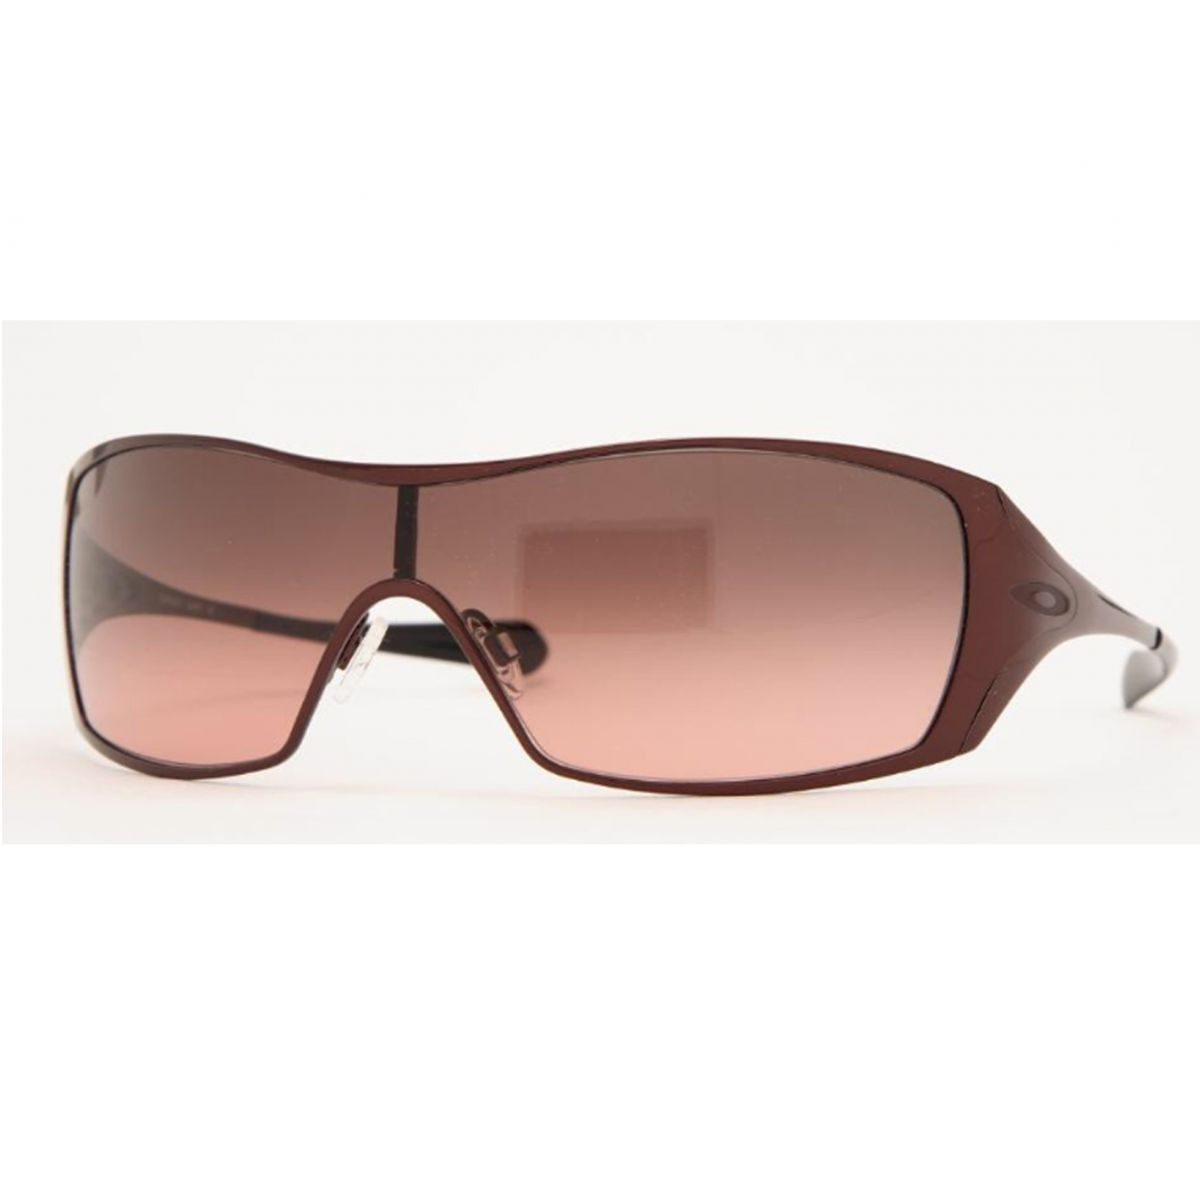 Oculos De Sol Oakley Feminino « Heritage Malta 1940bed5dd2